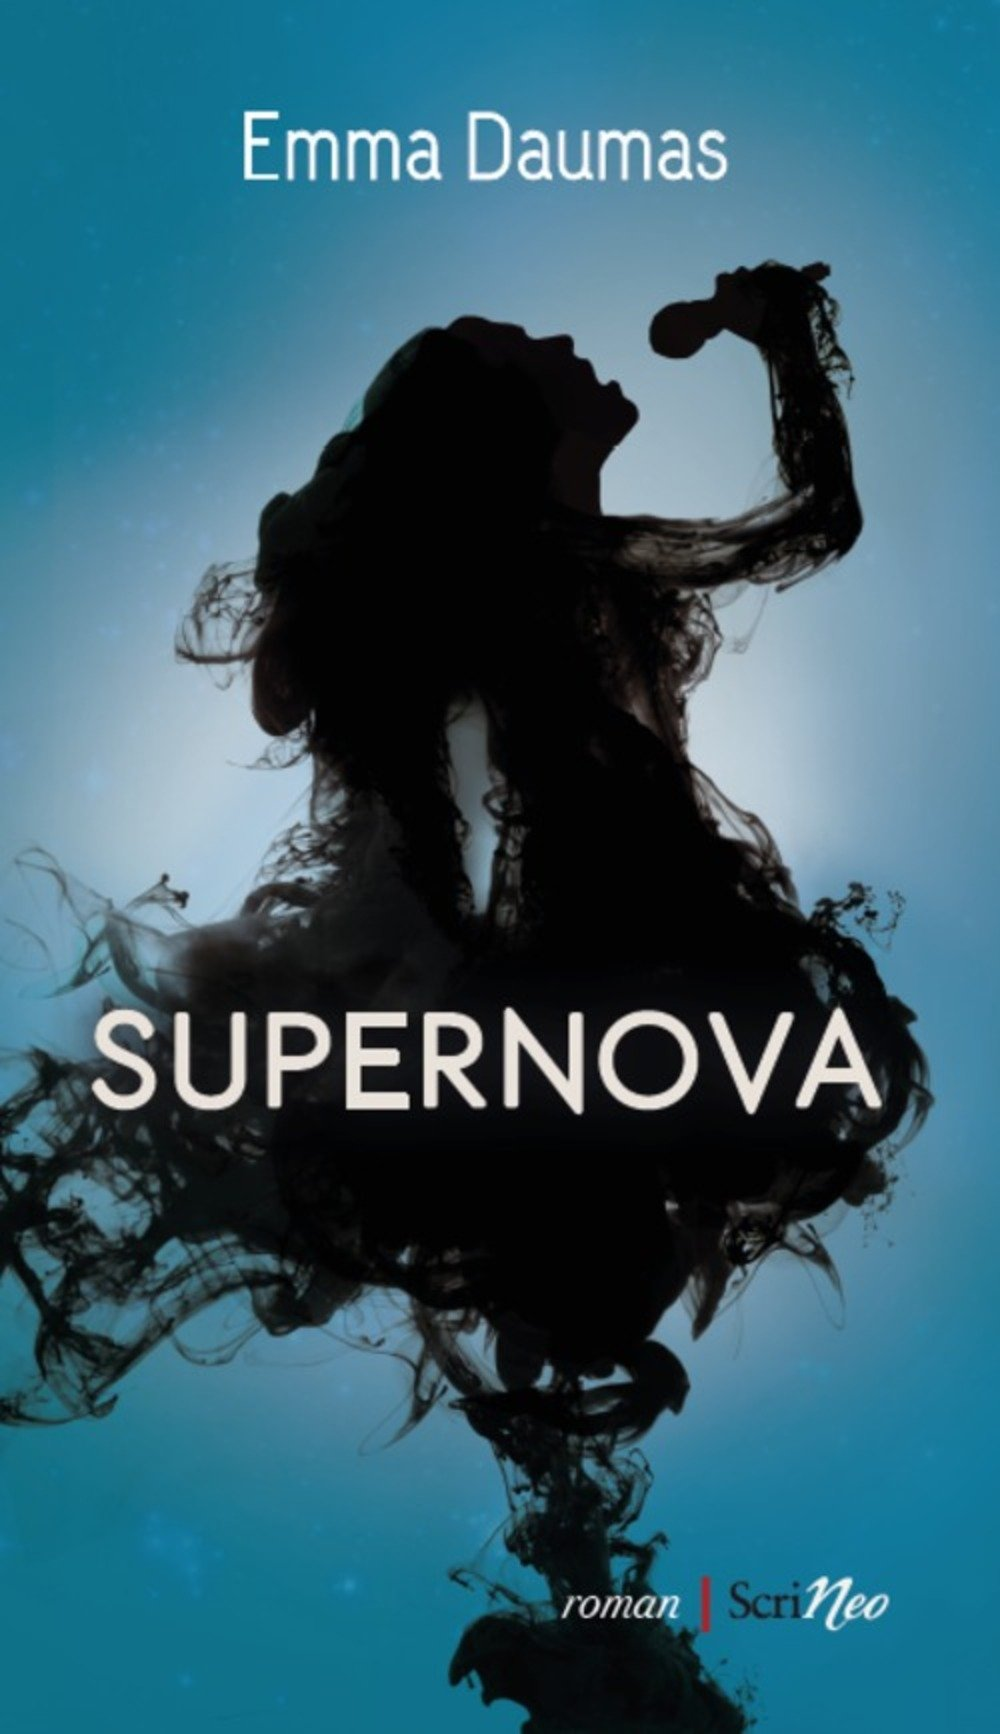 https://leslecturesdepampoune.blogspot.com/2016/04/supernova-emma-daumas.html